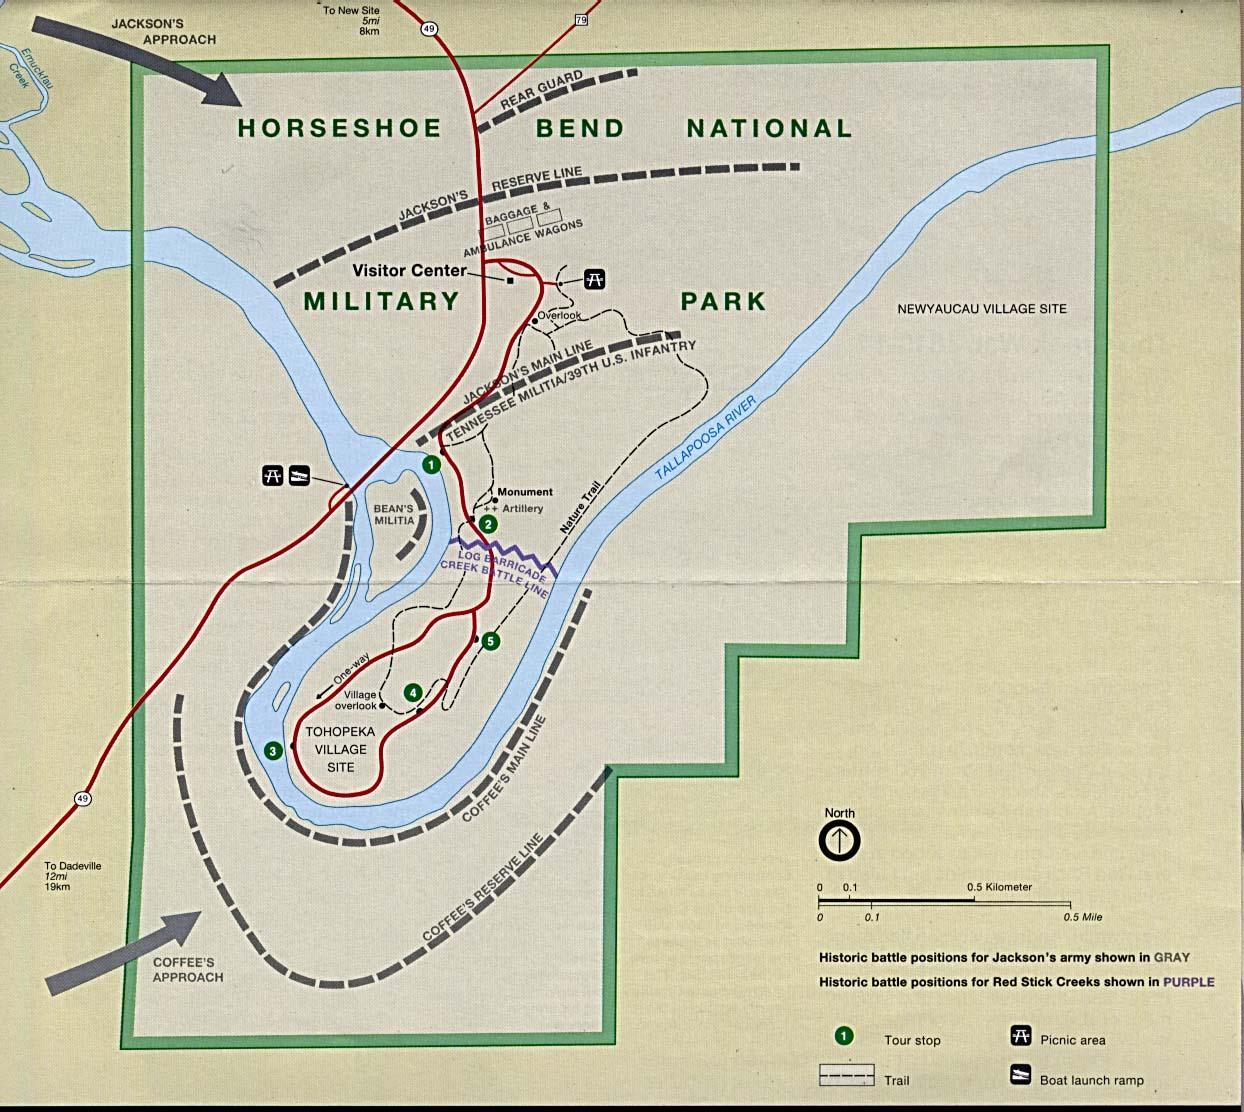 IMAGE(http://www.reisenett.no/map_collection/National_parks/Horseshoe_Bend_map.jpg)